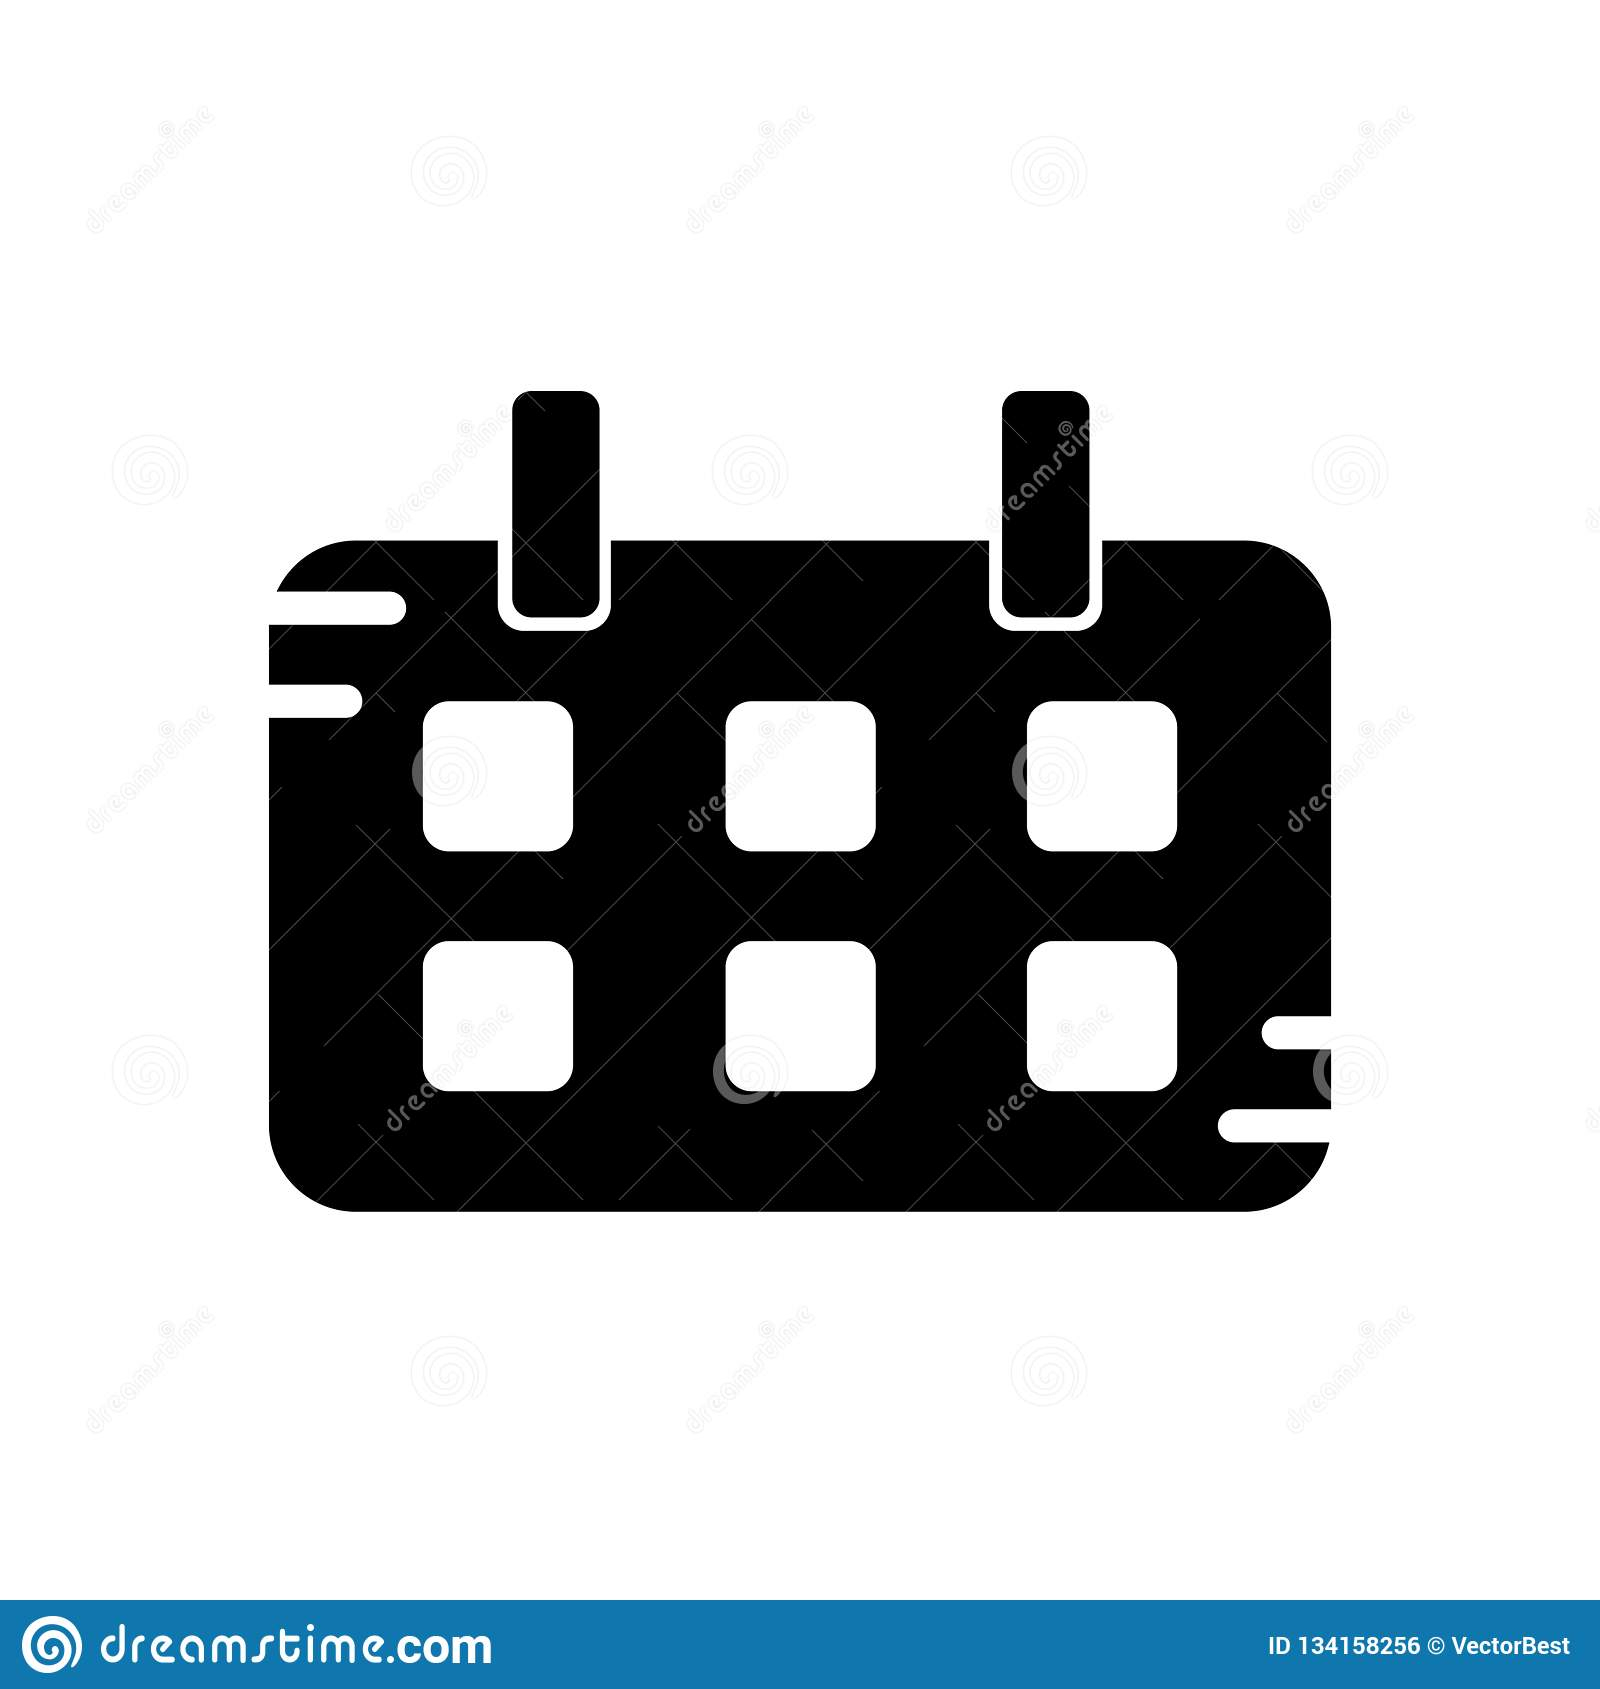 Calendar Icon Vector Sign And Symbol Isolated On White regarding Material Design Calendar Icon